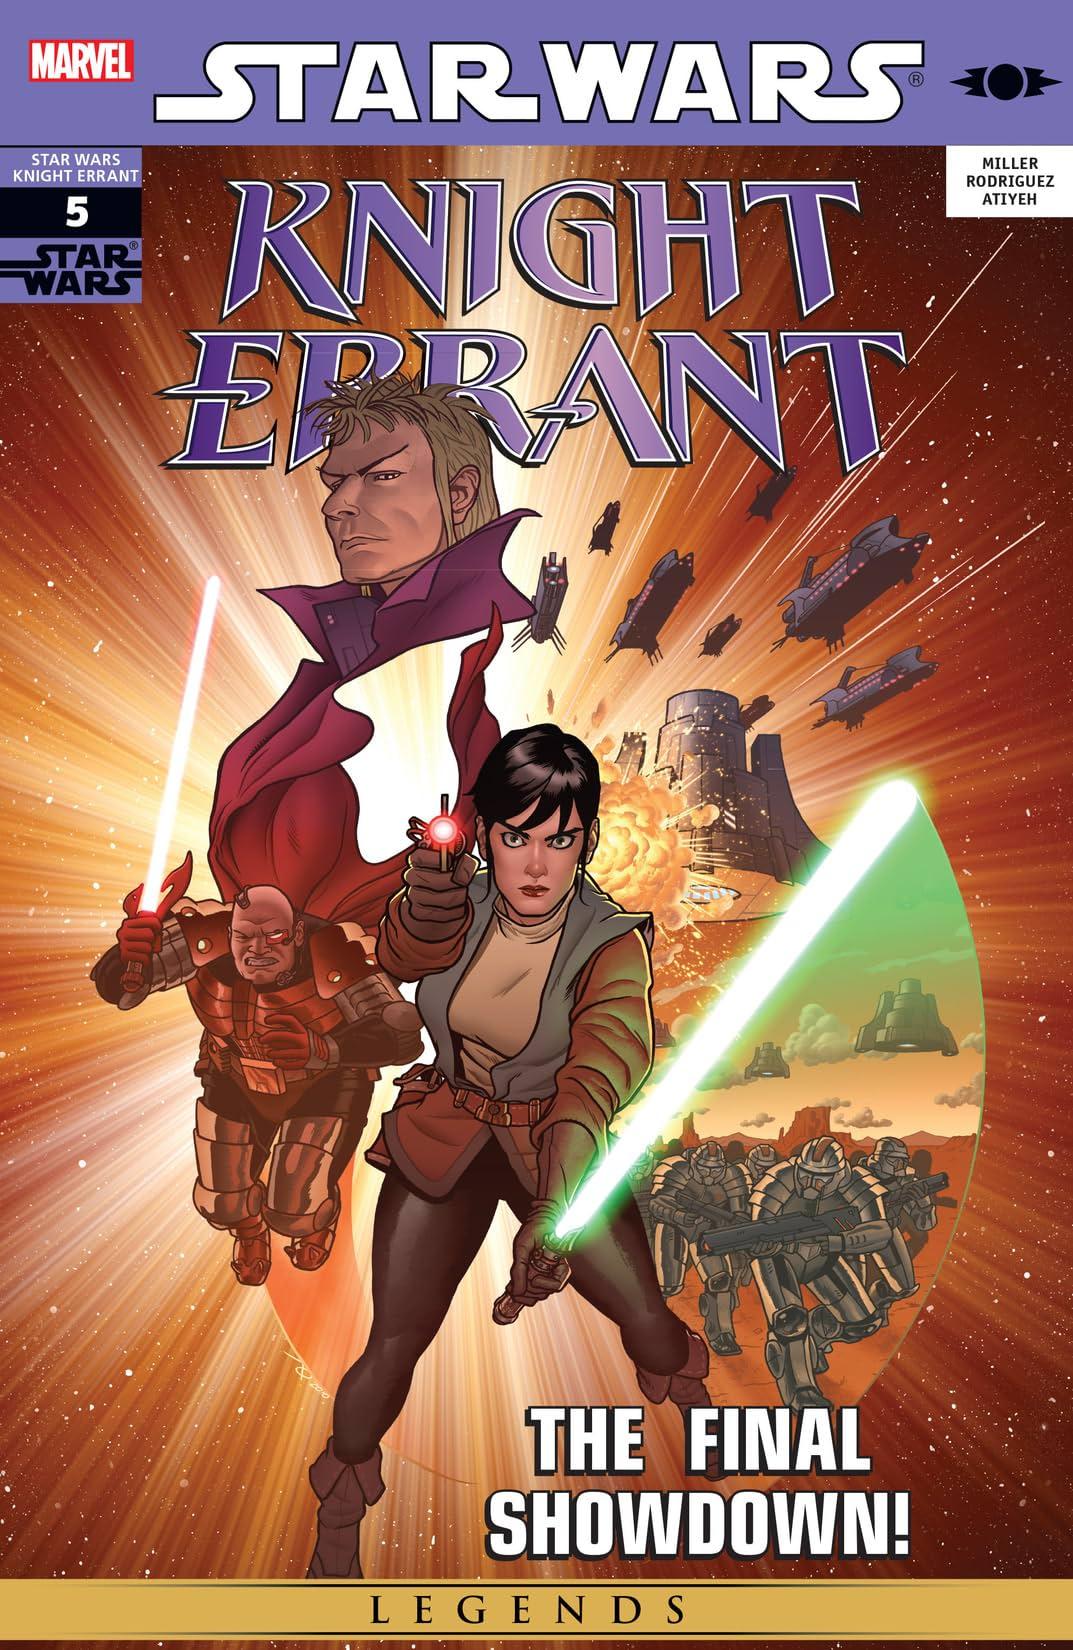 Star Wars: Knight Errant (2010-2011) #5 (of 5)